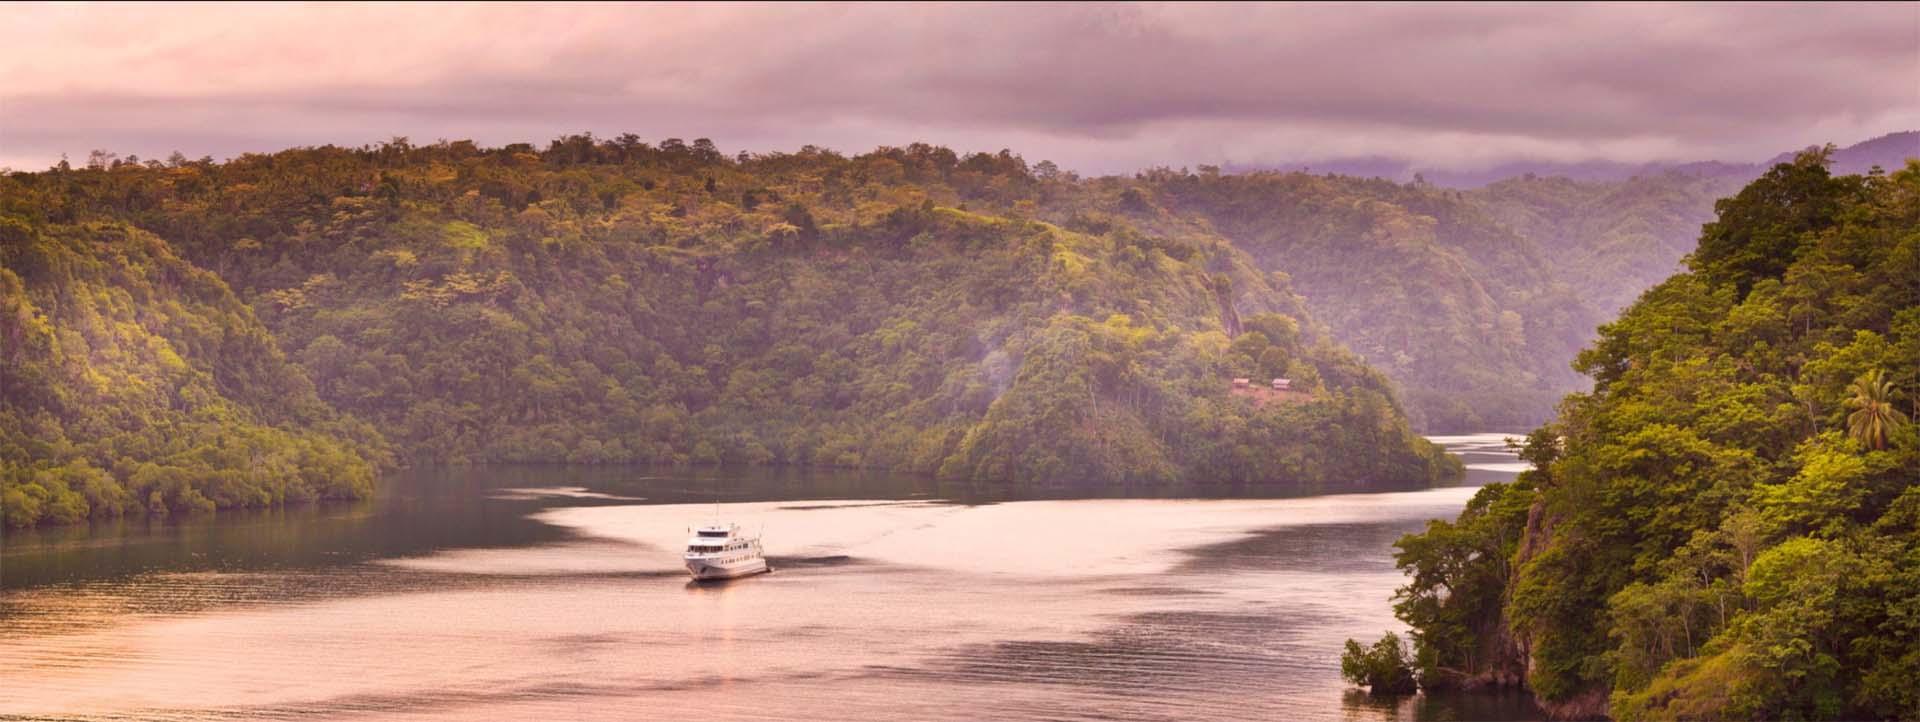 TRUE NORTH Adventures in Paradise cruise vessel at dawn